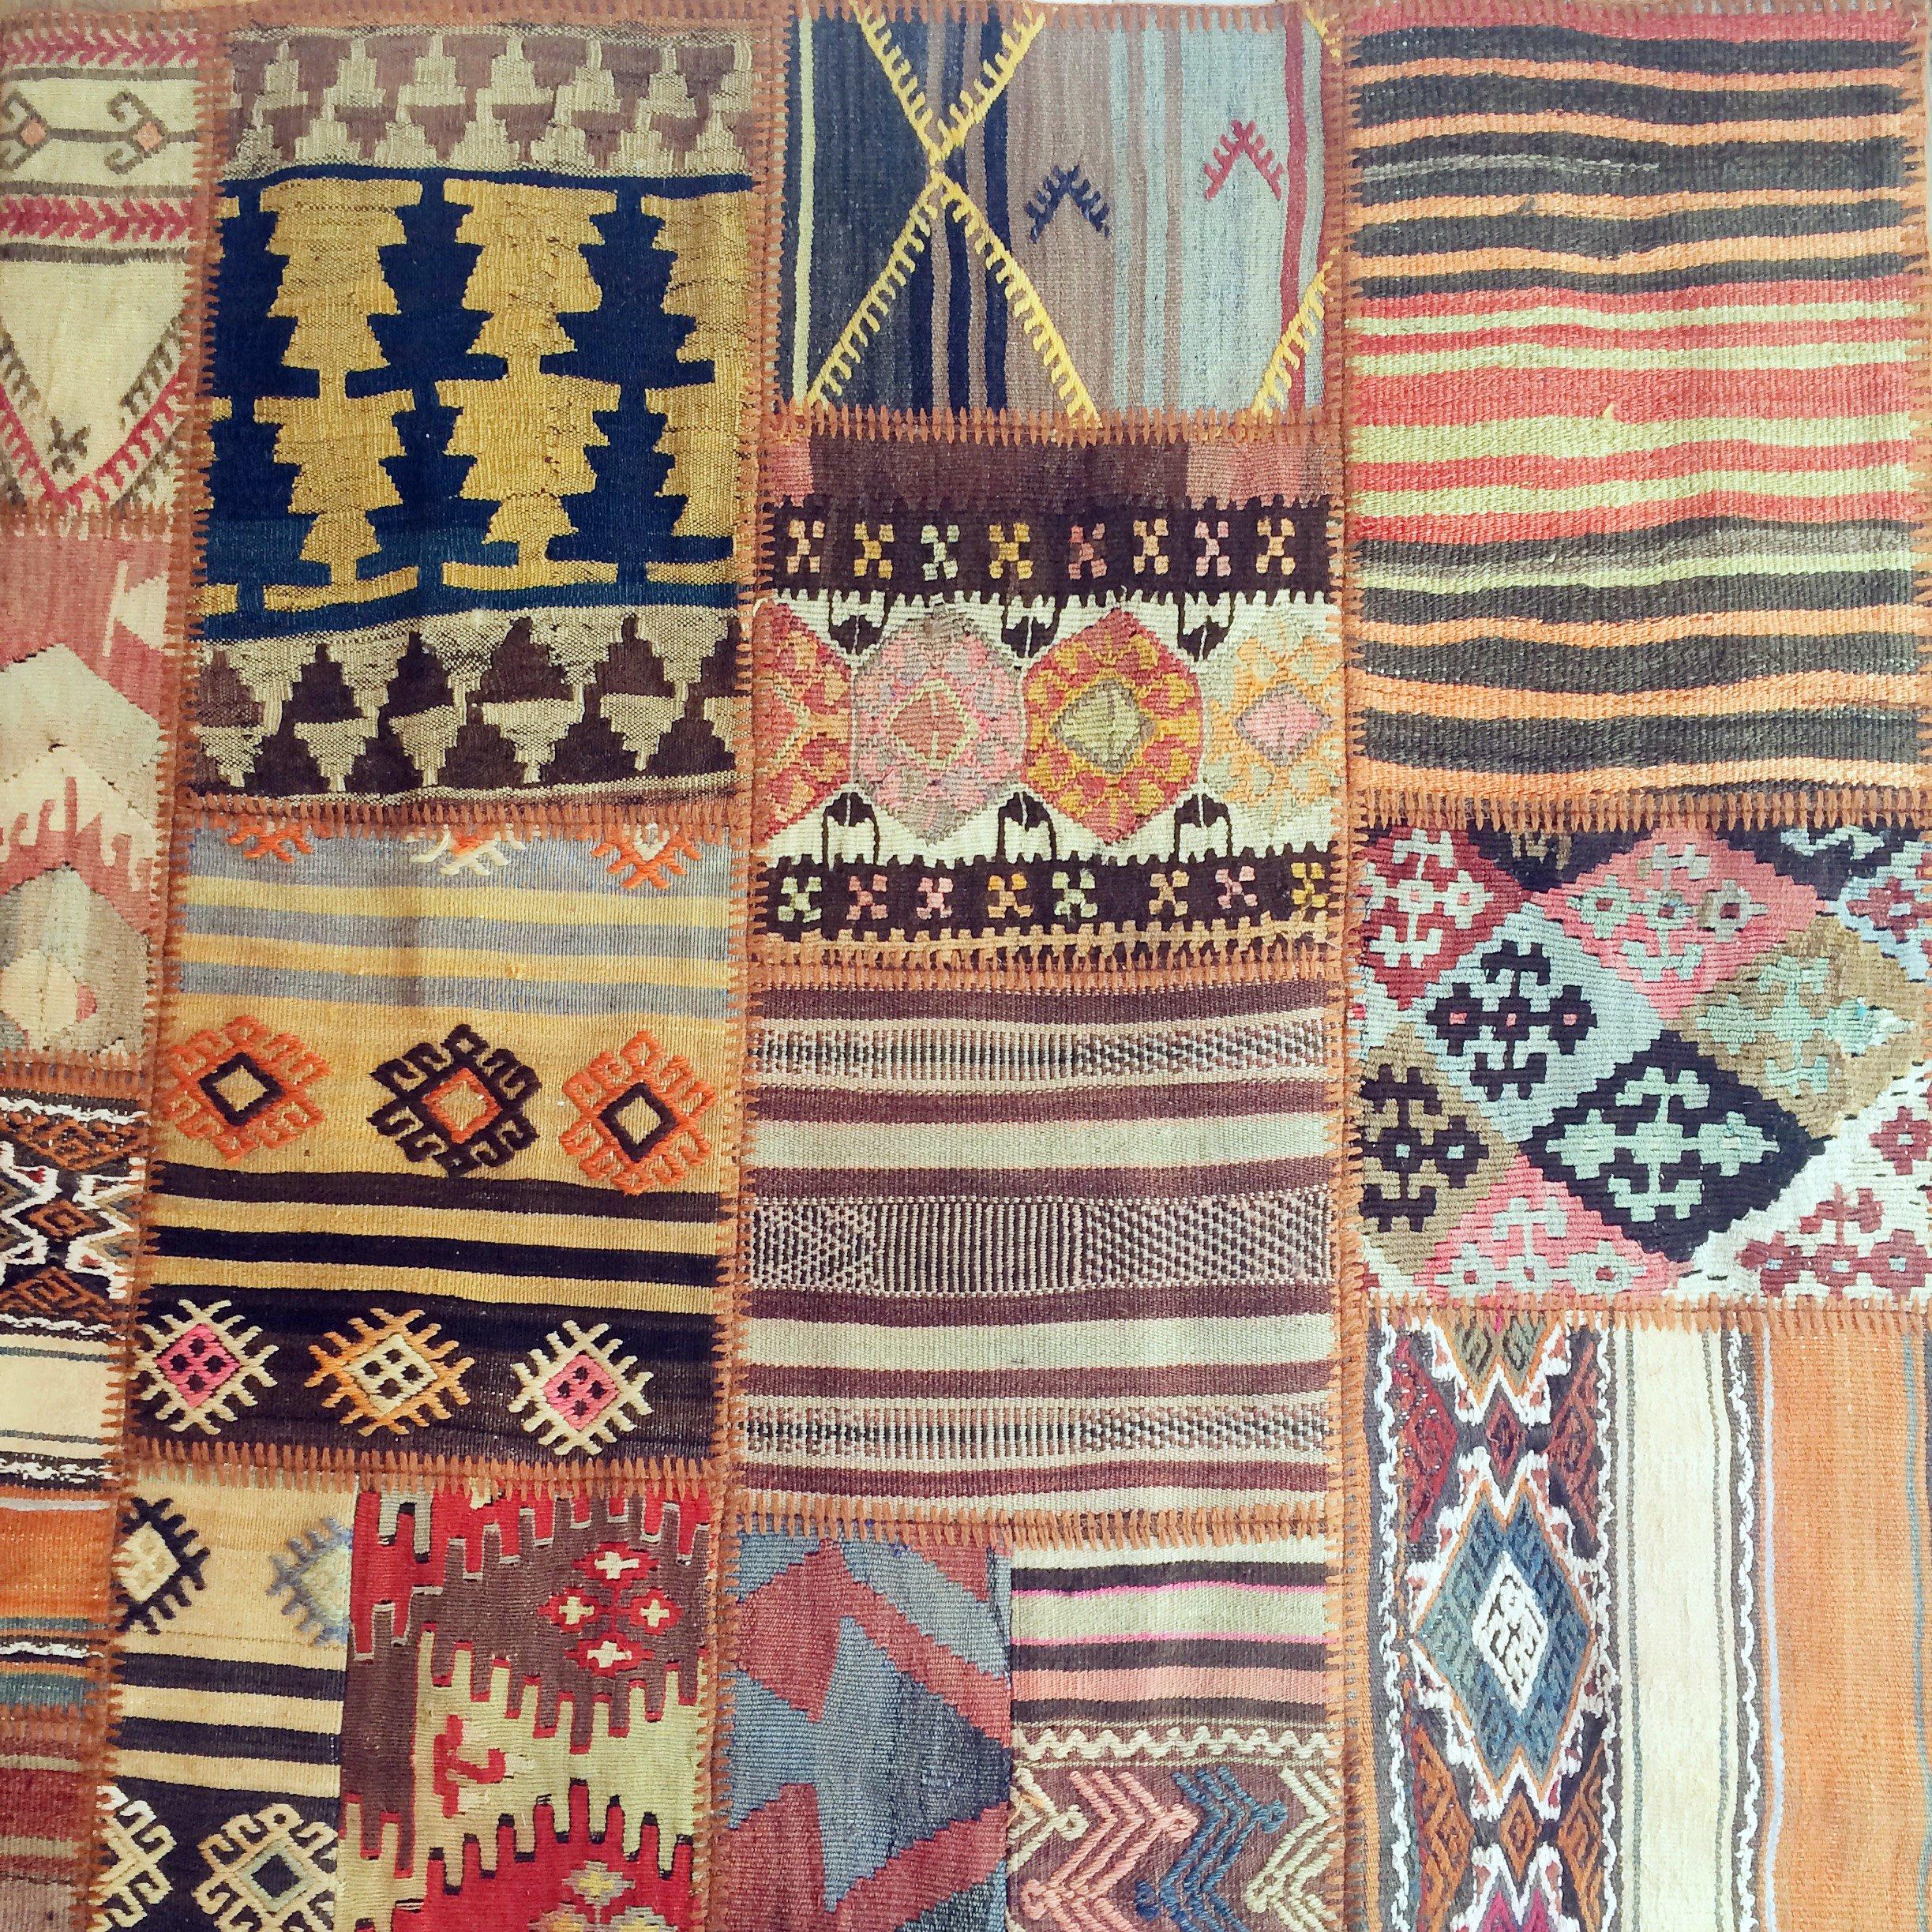 Unik handgjord matta av kelimbitar